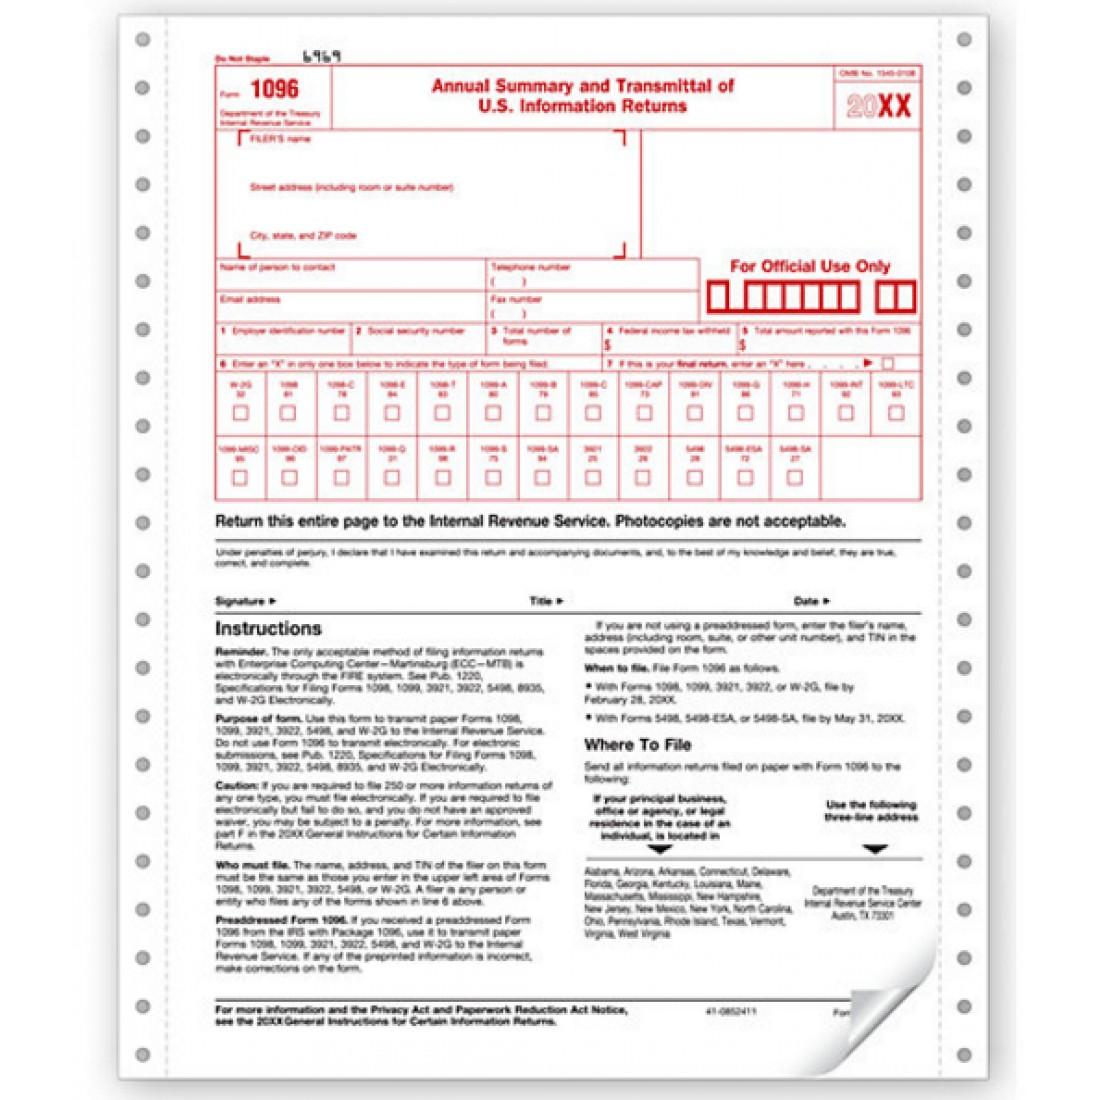 tax form 1096 - Heart.impulsar.co